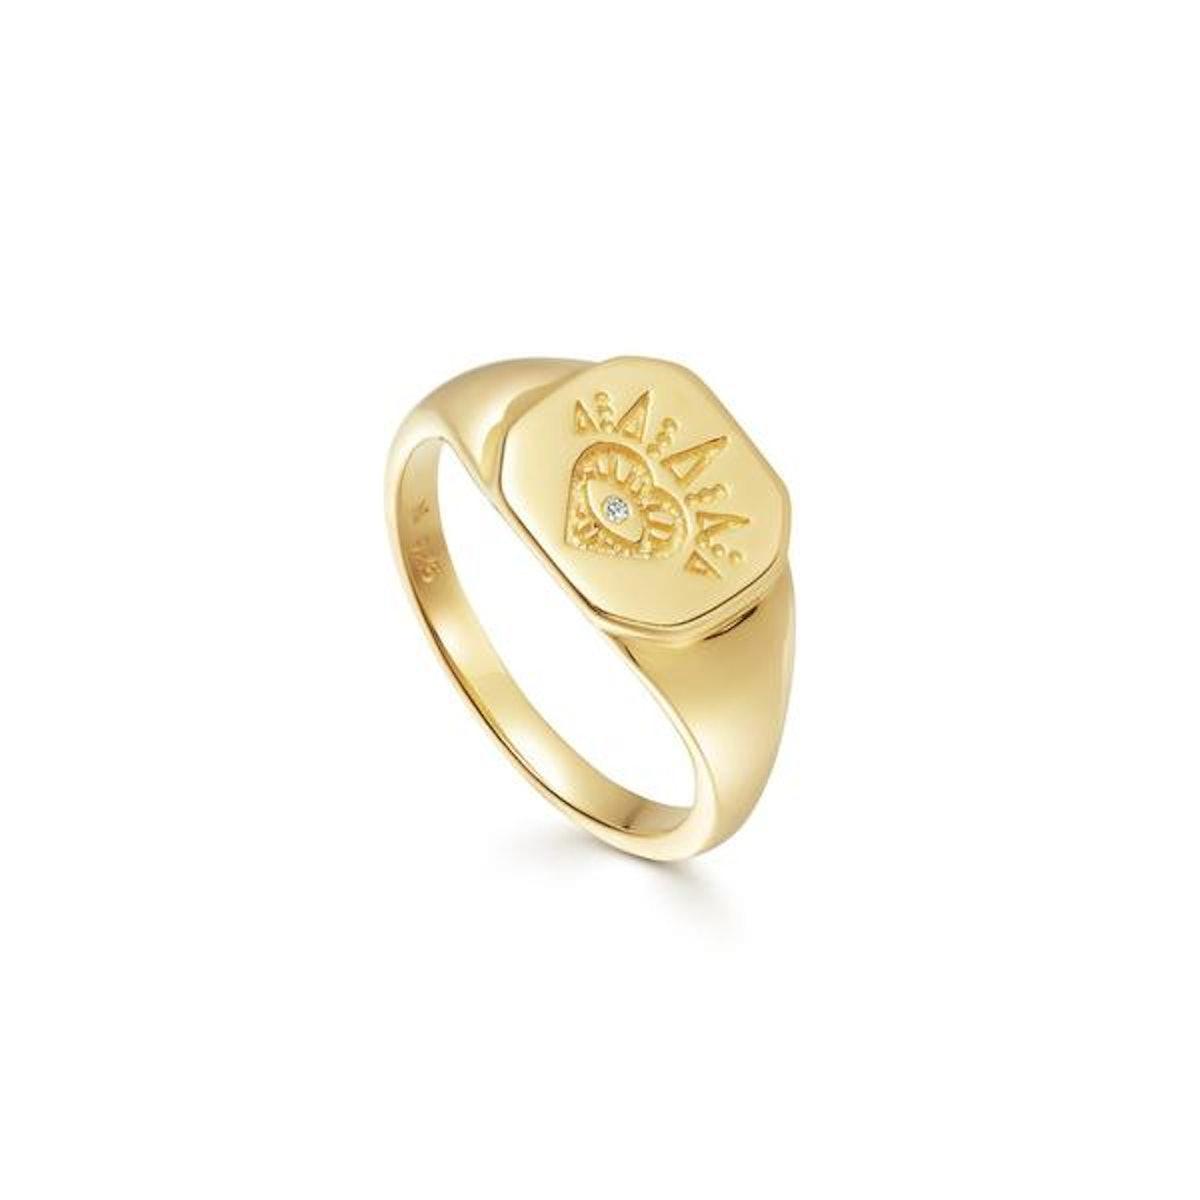 Gold open heart signet ring